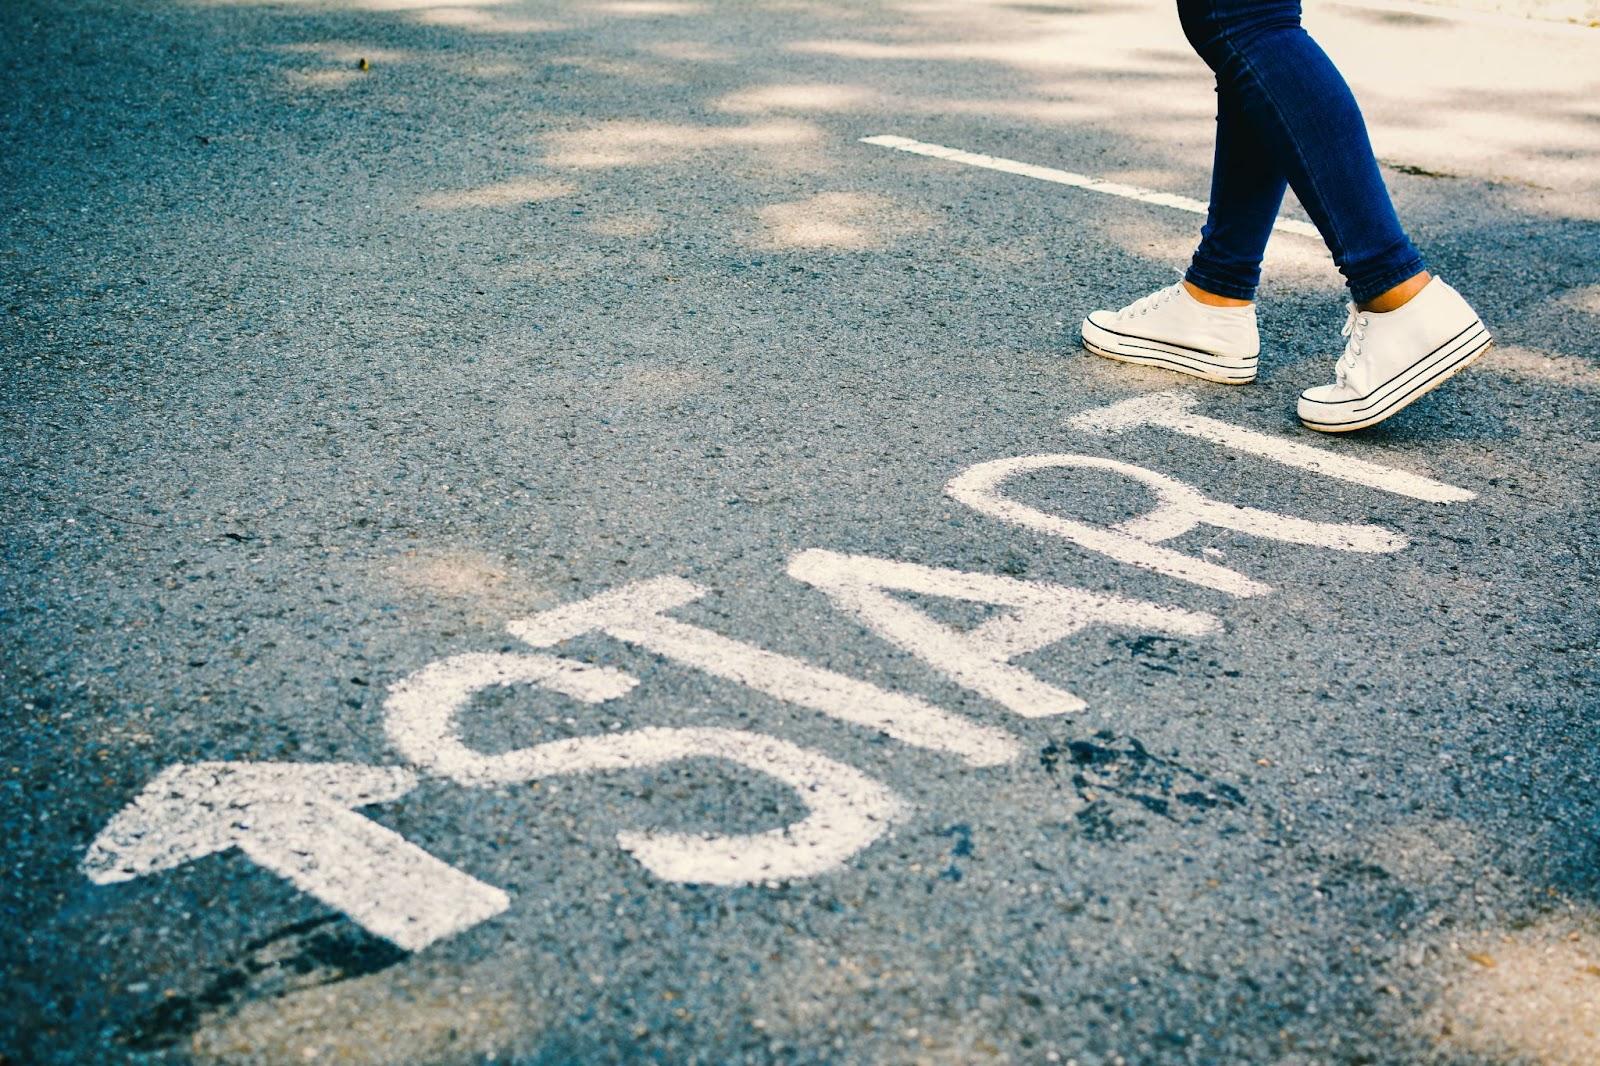 start painted on the street